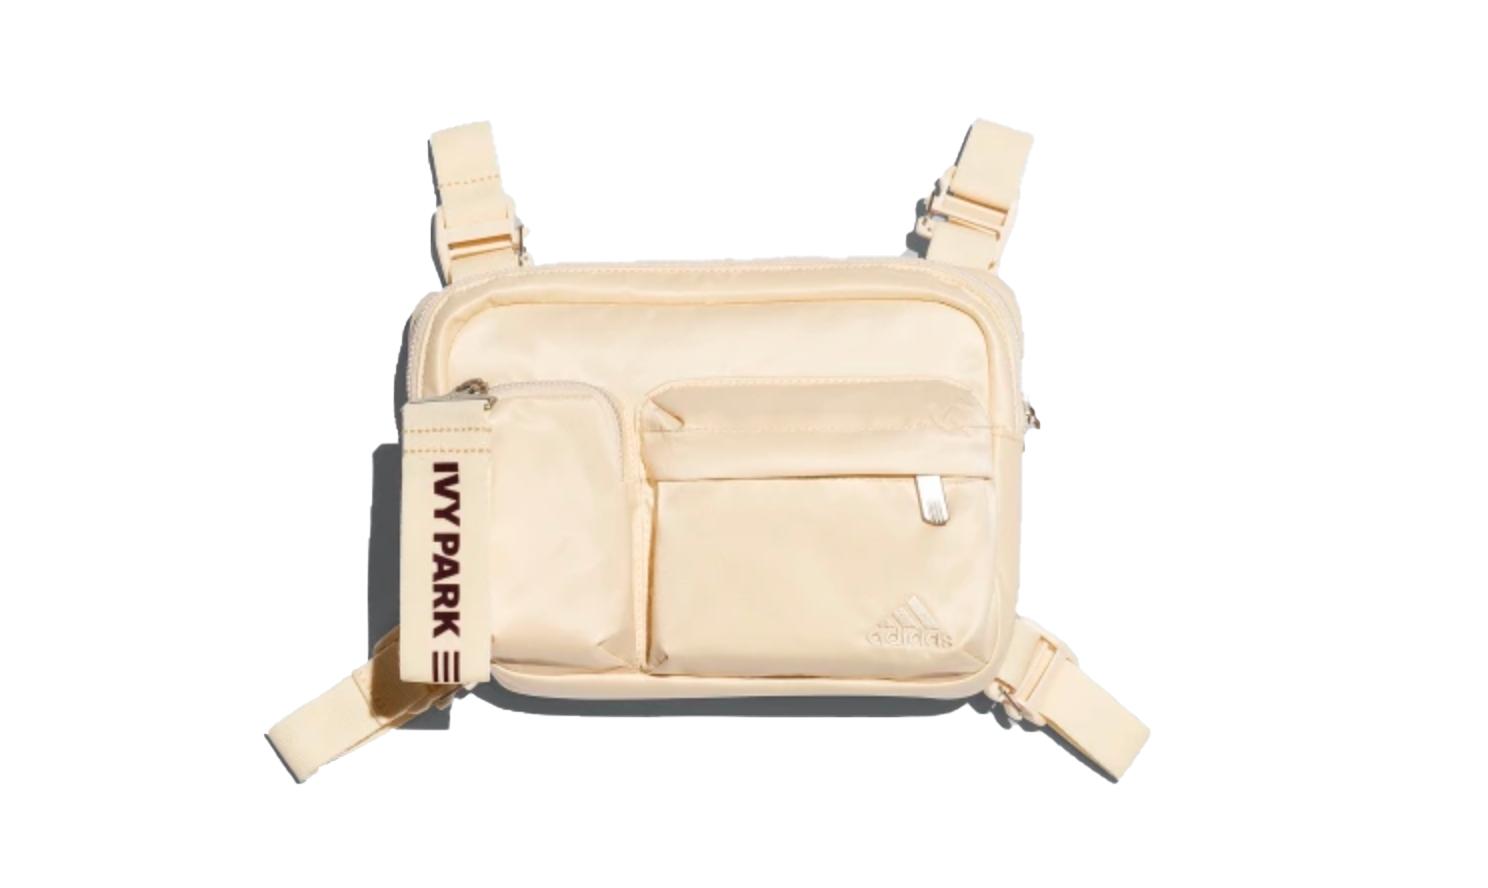 Adidas Originals Adidas Ivy Park Harness Bag Ecru Tint/maroon